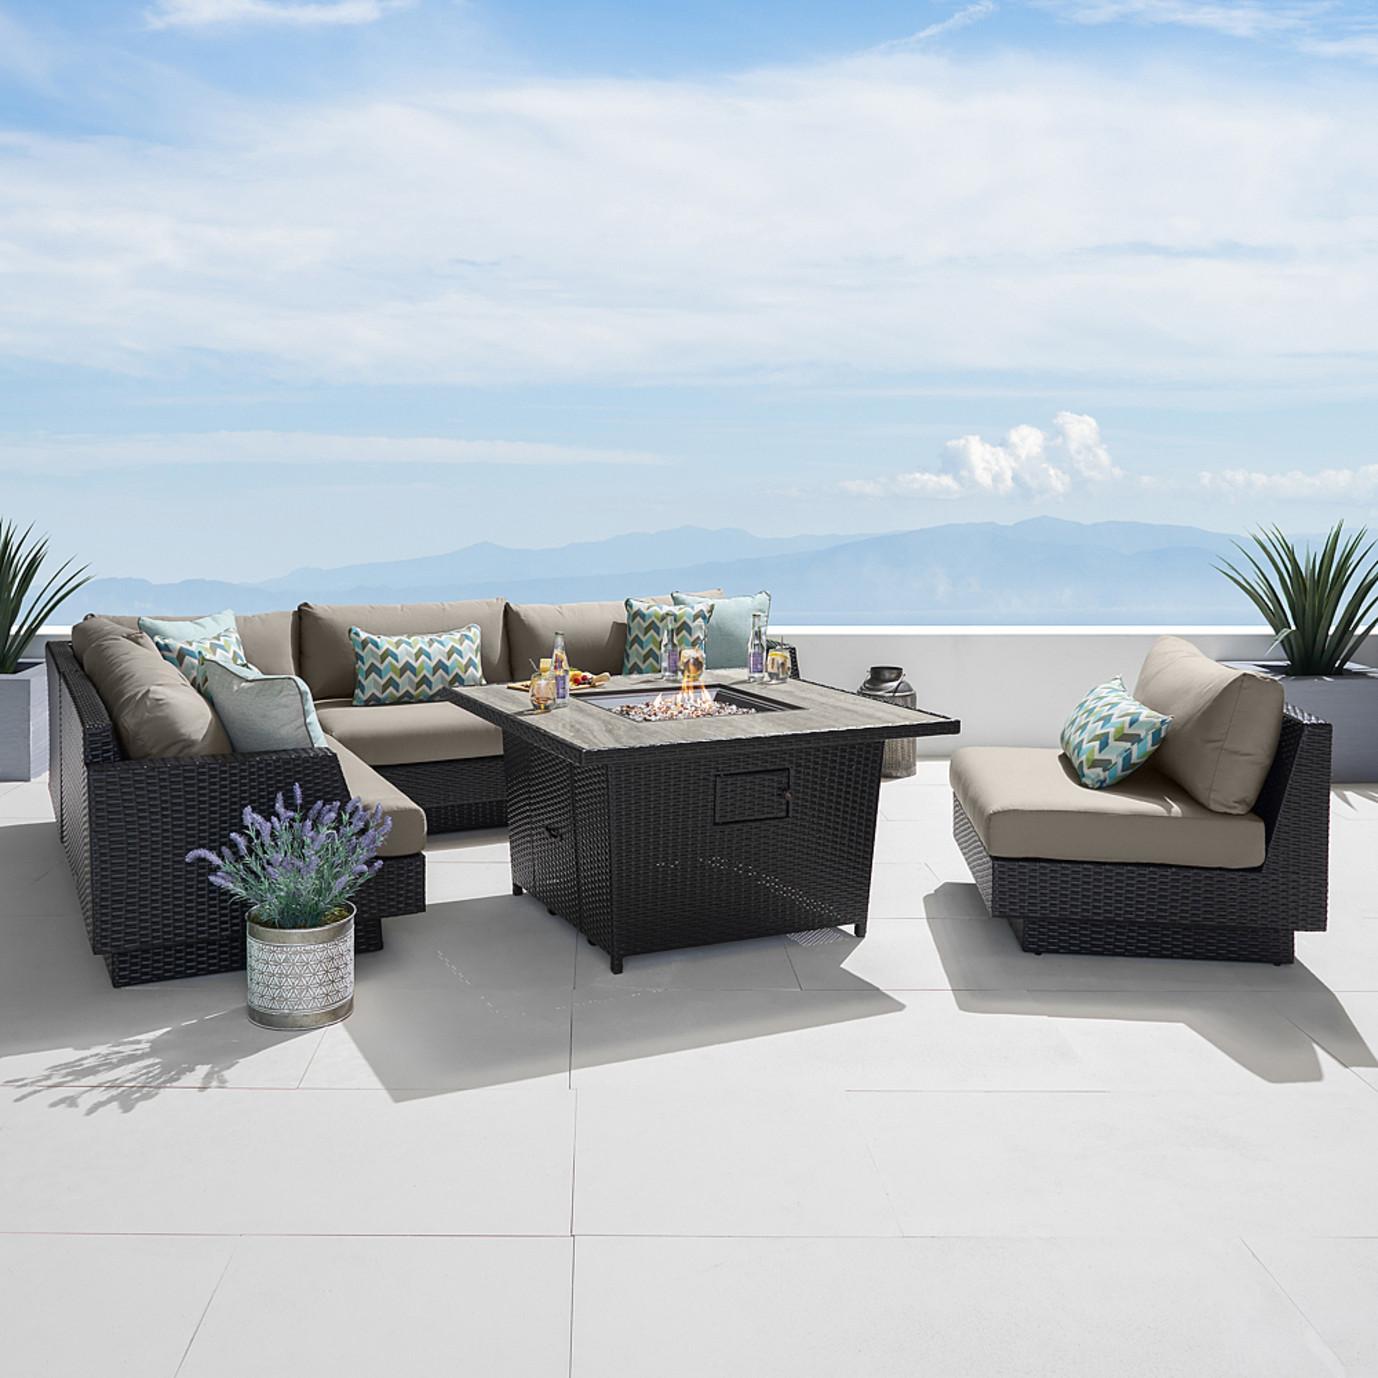 Portofino Comfort 6pc Sectional With Fire Table Espresso